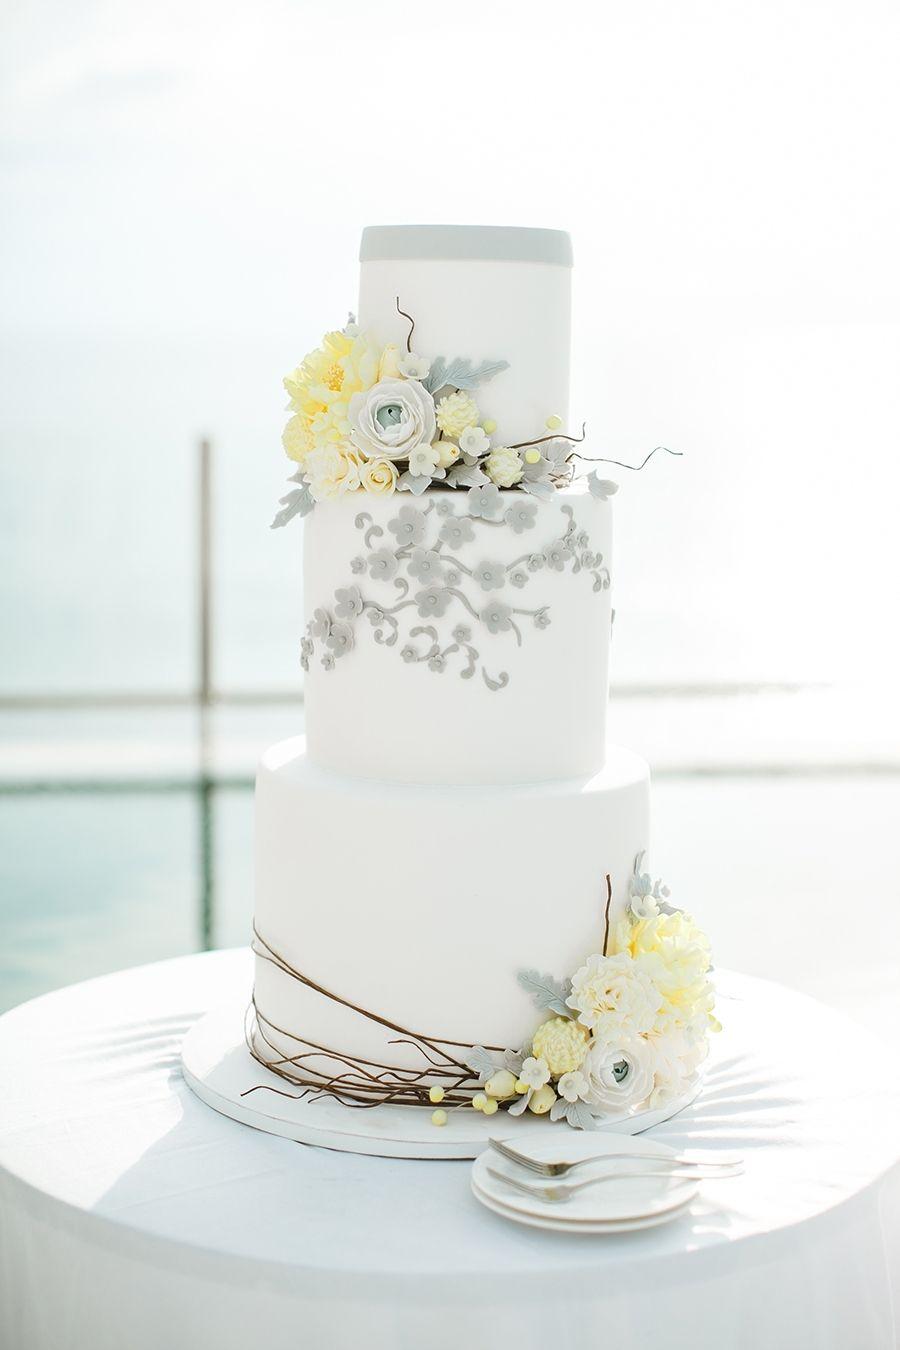 Wedding Cakes Near Spring Tx | Wedding Dress | Pinterest | Wedding ...